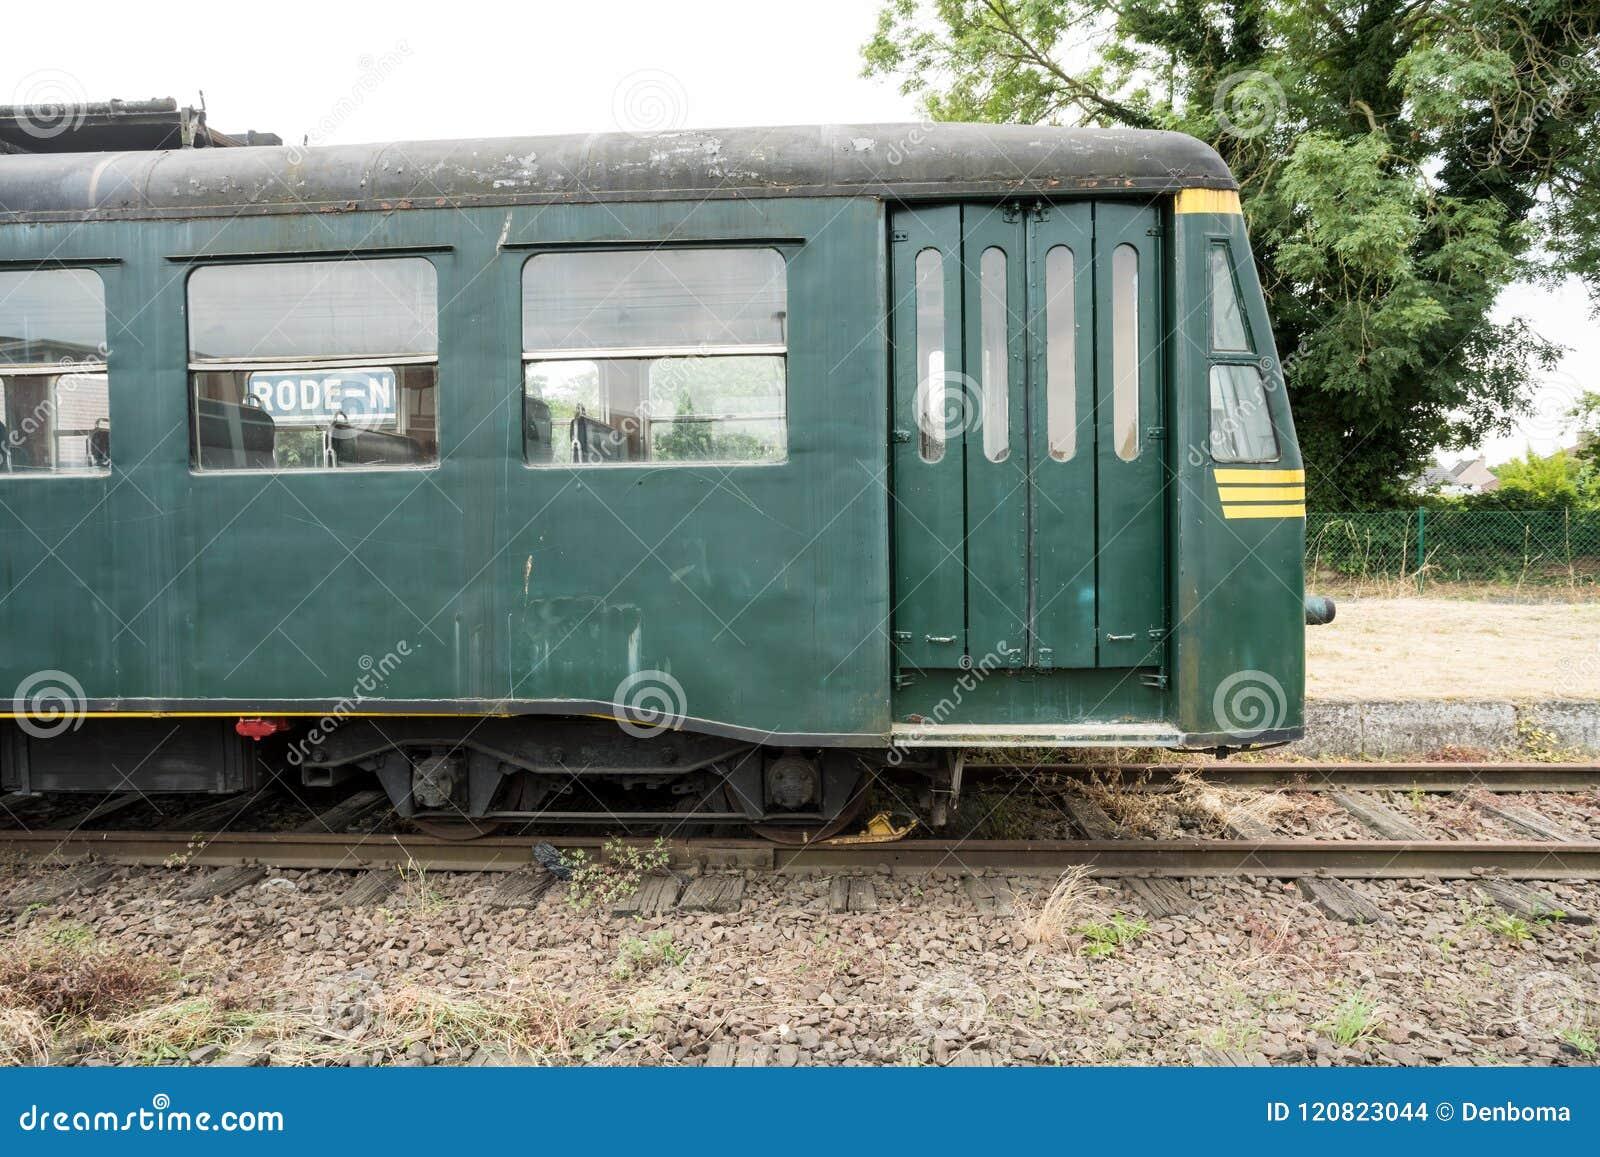 An old train